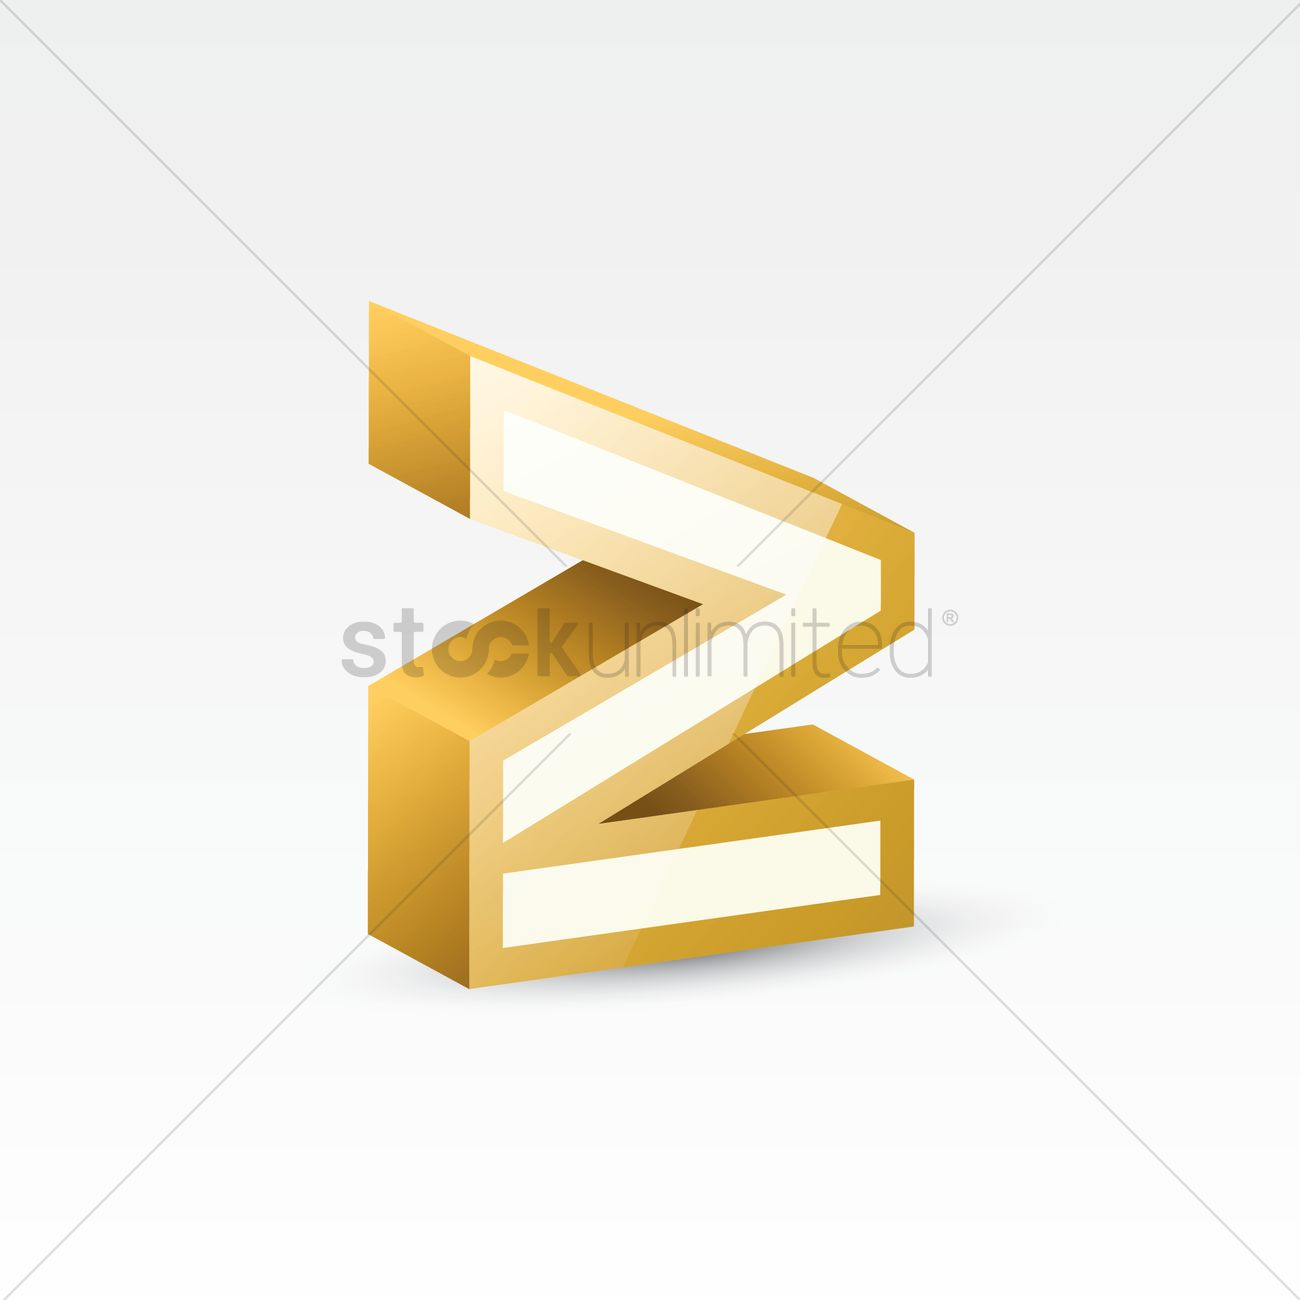 Greater than equal to symbol vector image 1617120 stockunlimited greater than equal to symbol vector graphic buycottarizona